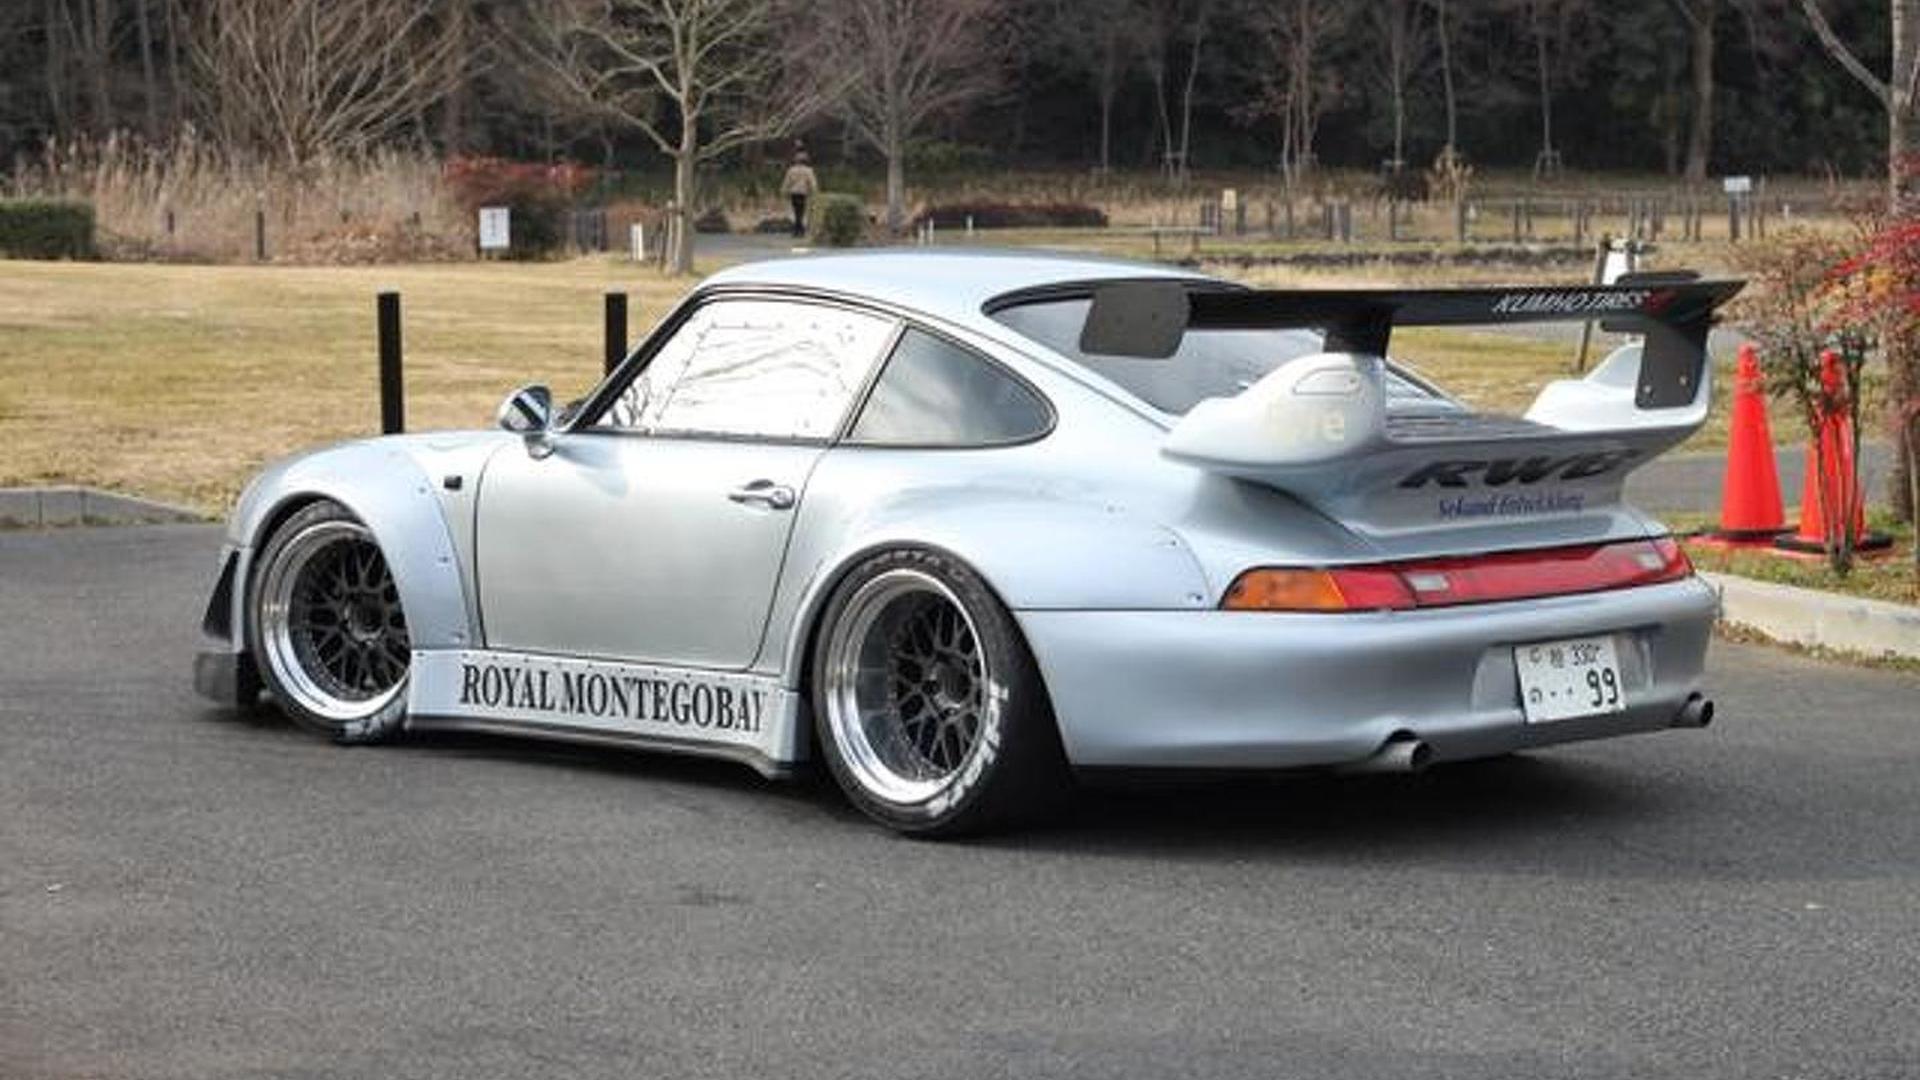 RAUH,Welt Begriff super wide body Porsche 911s for the